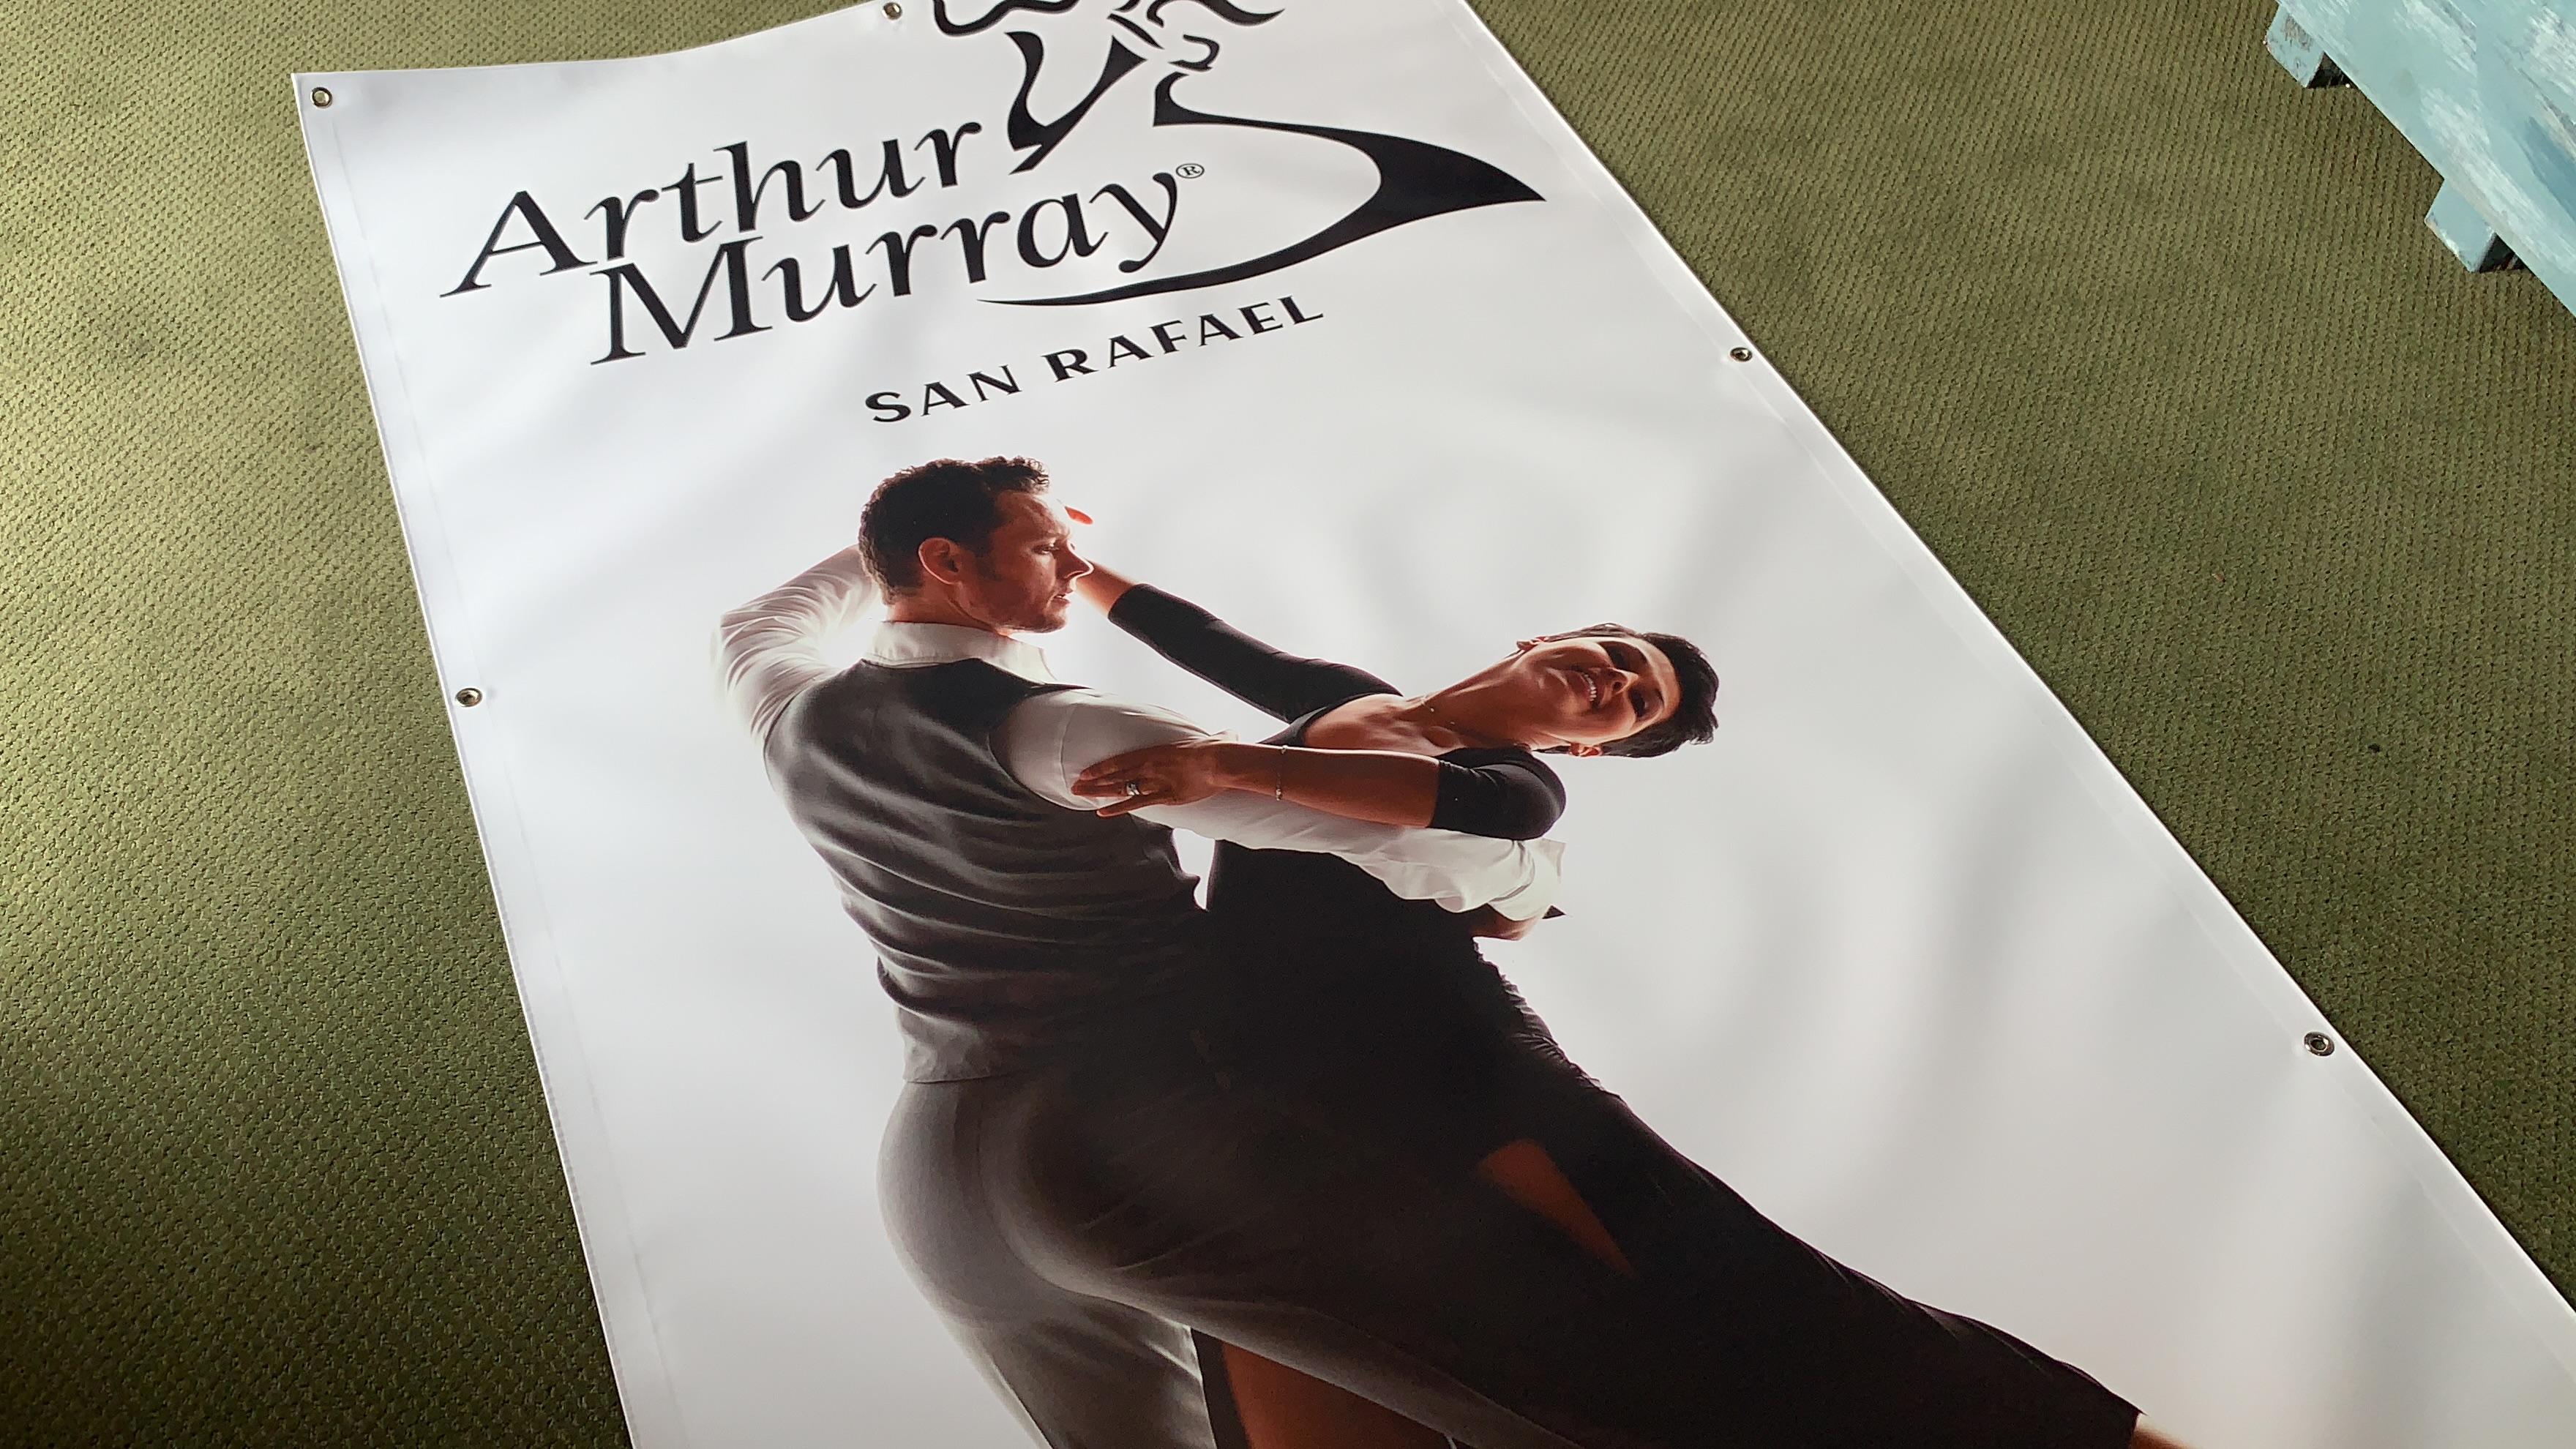 ARTHUR MURRAY DANCE STUDIO image 1